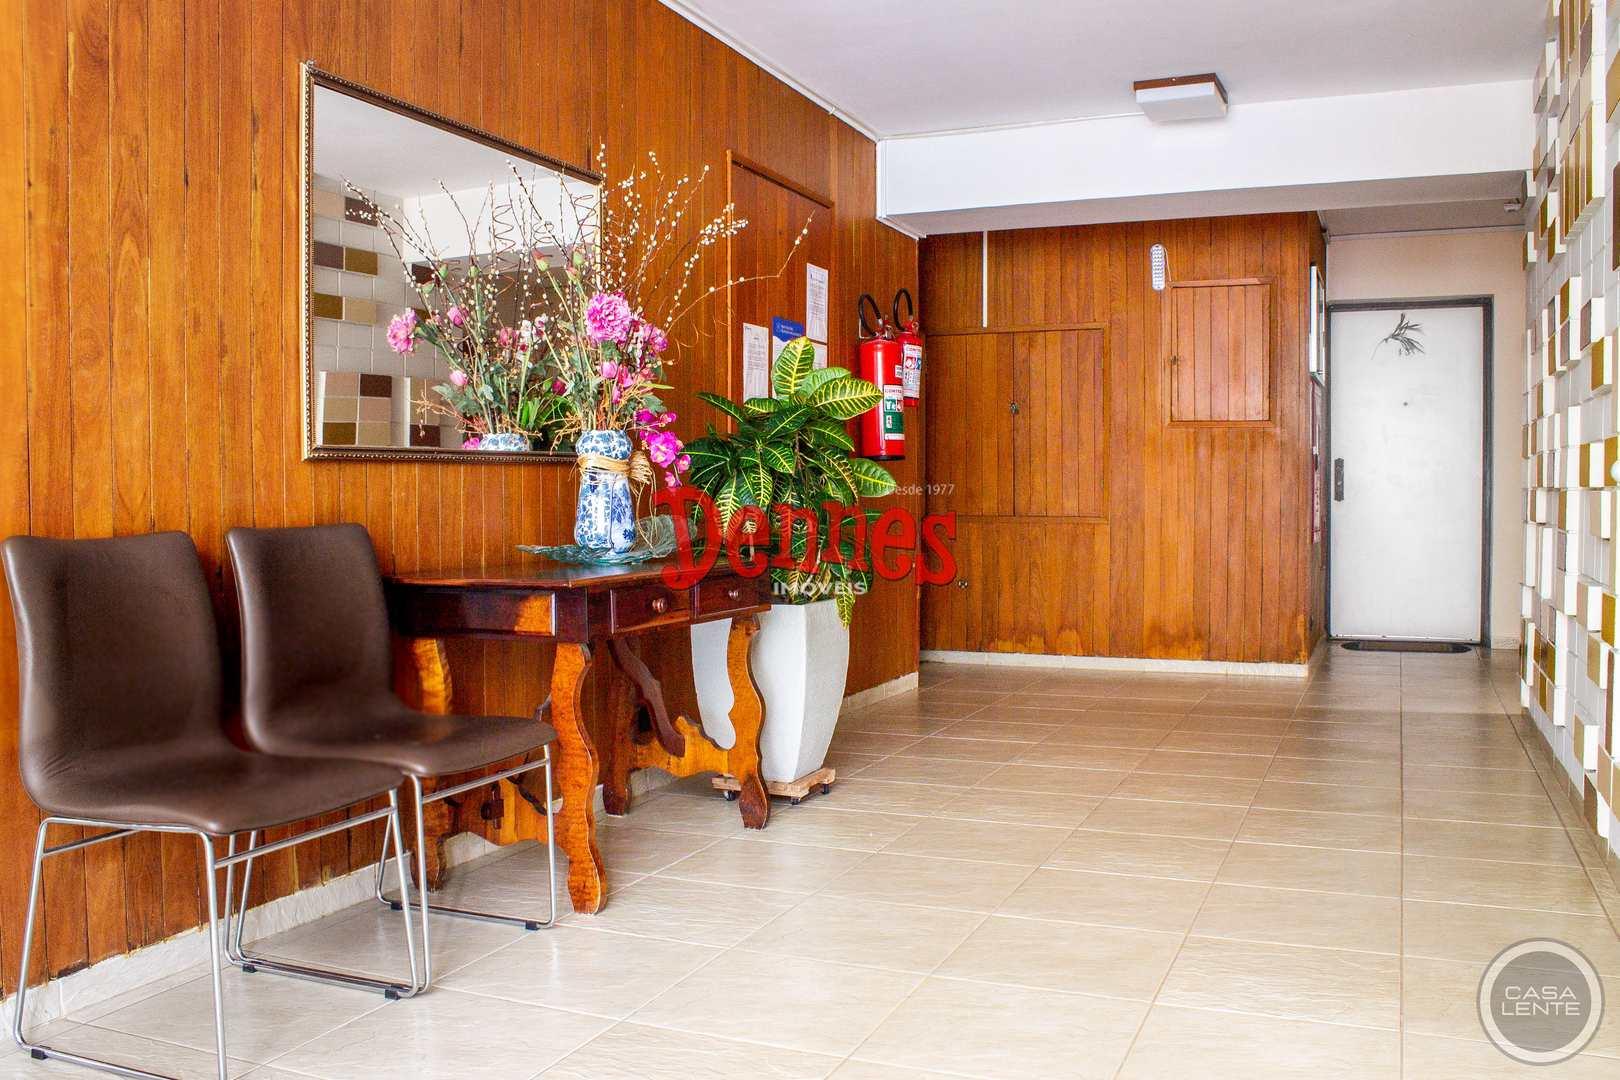 Apartamento com 2 dorms, Vila Santa Catarina, São Paulo - R$ 519 mil, Cod: 513